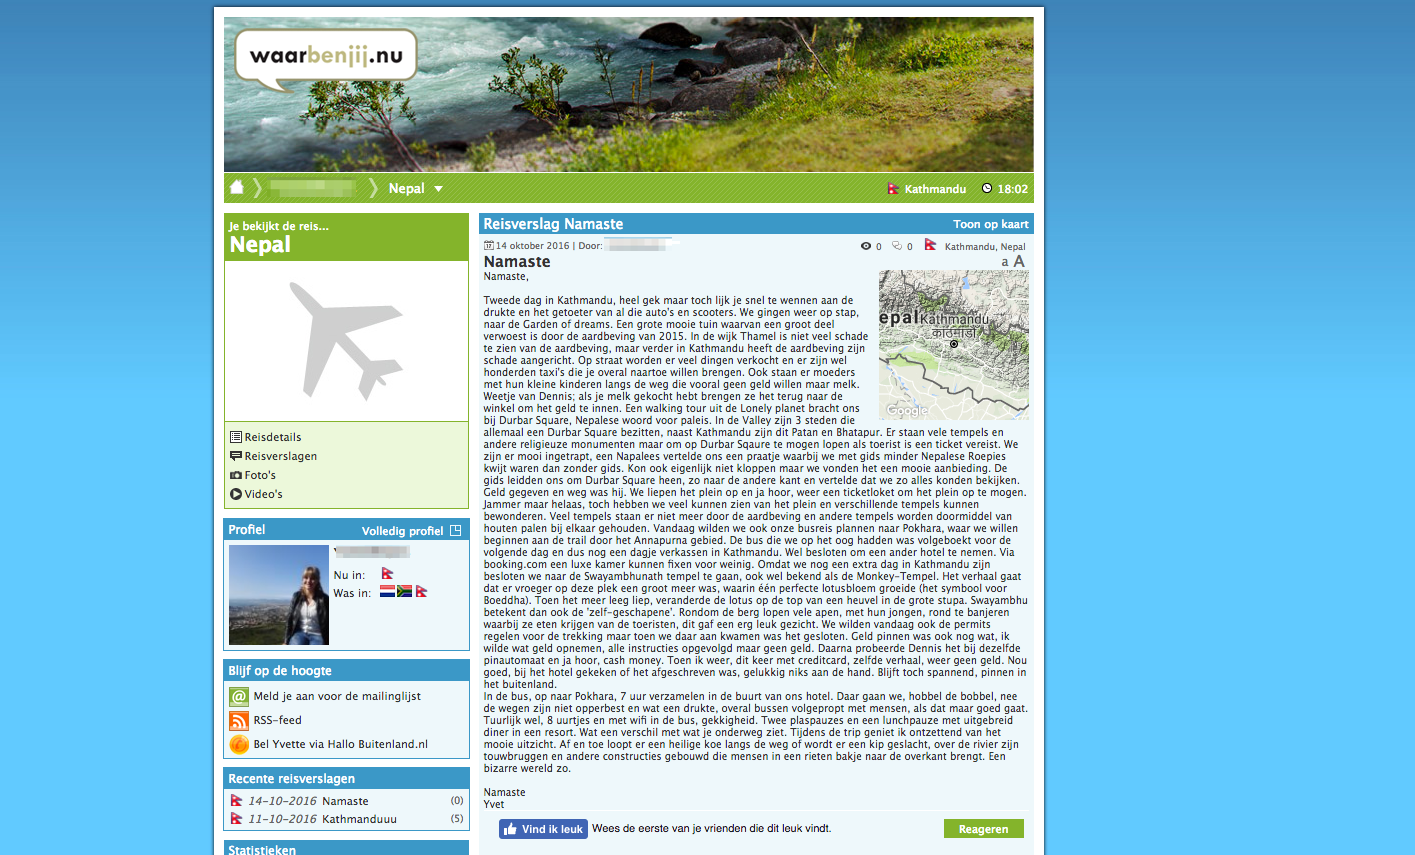 namaste_-_reisverslag_uit_kathmandu_